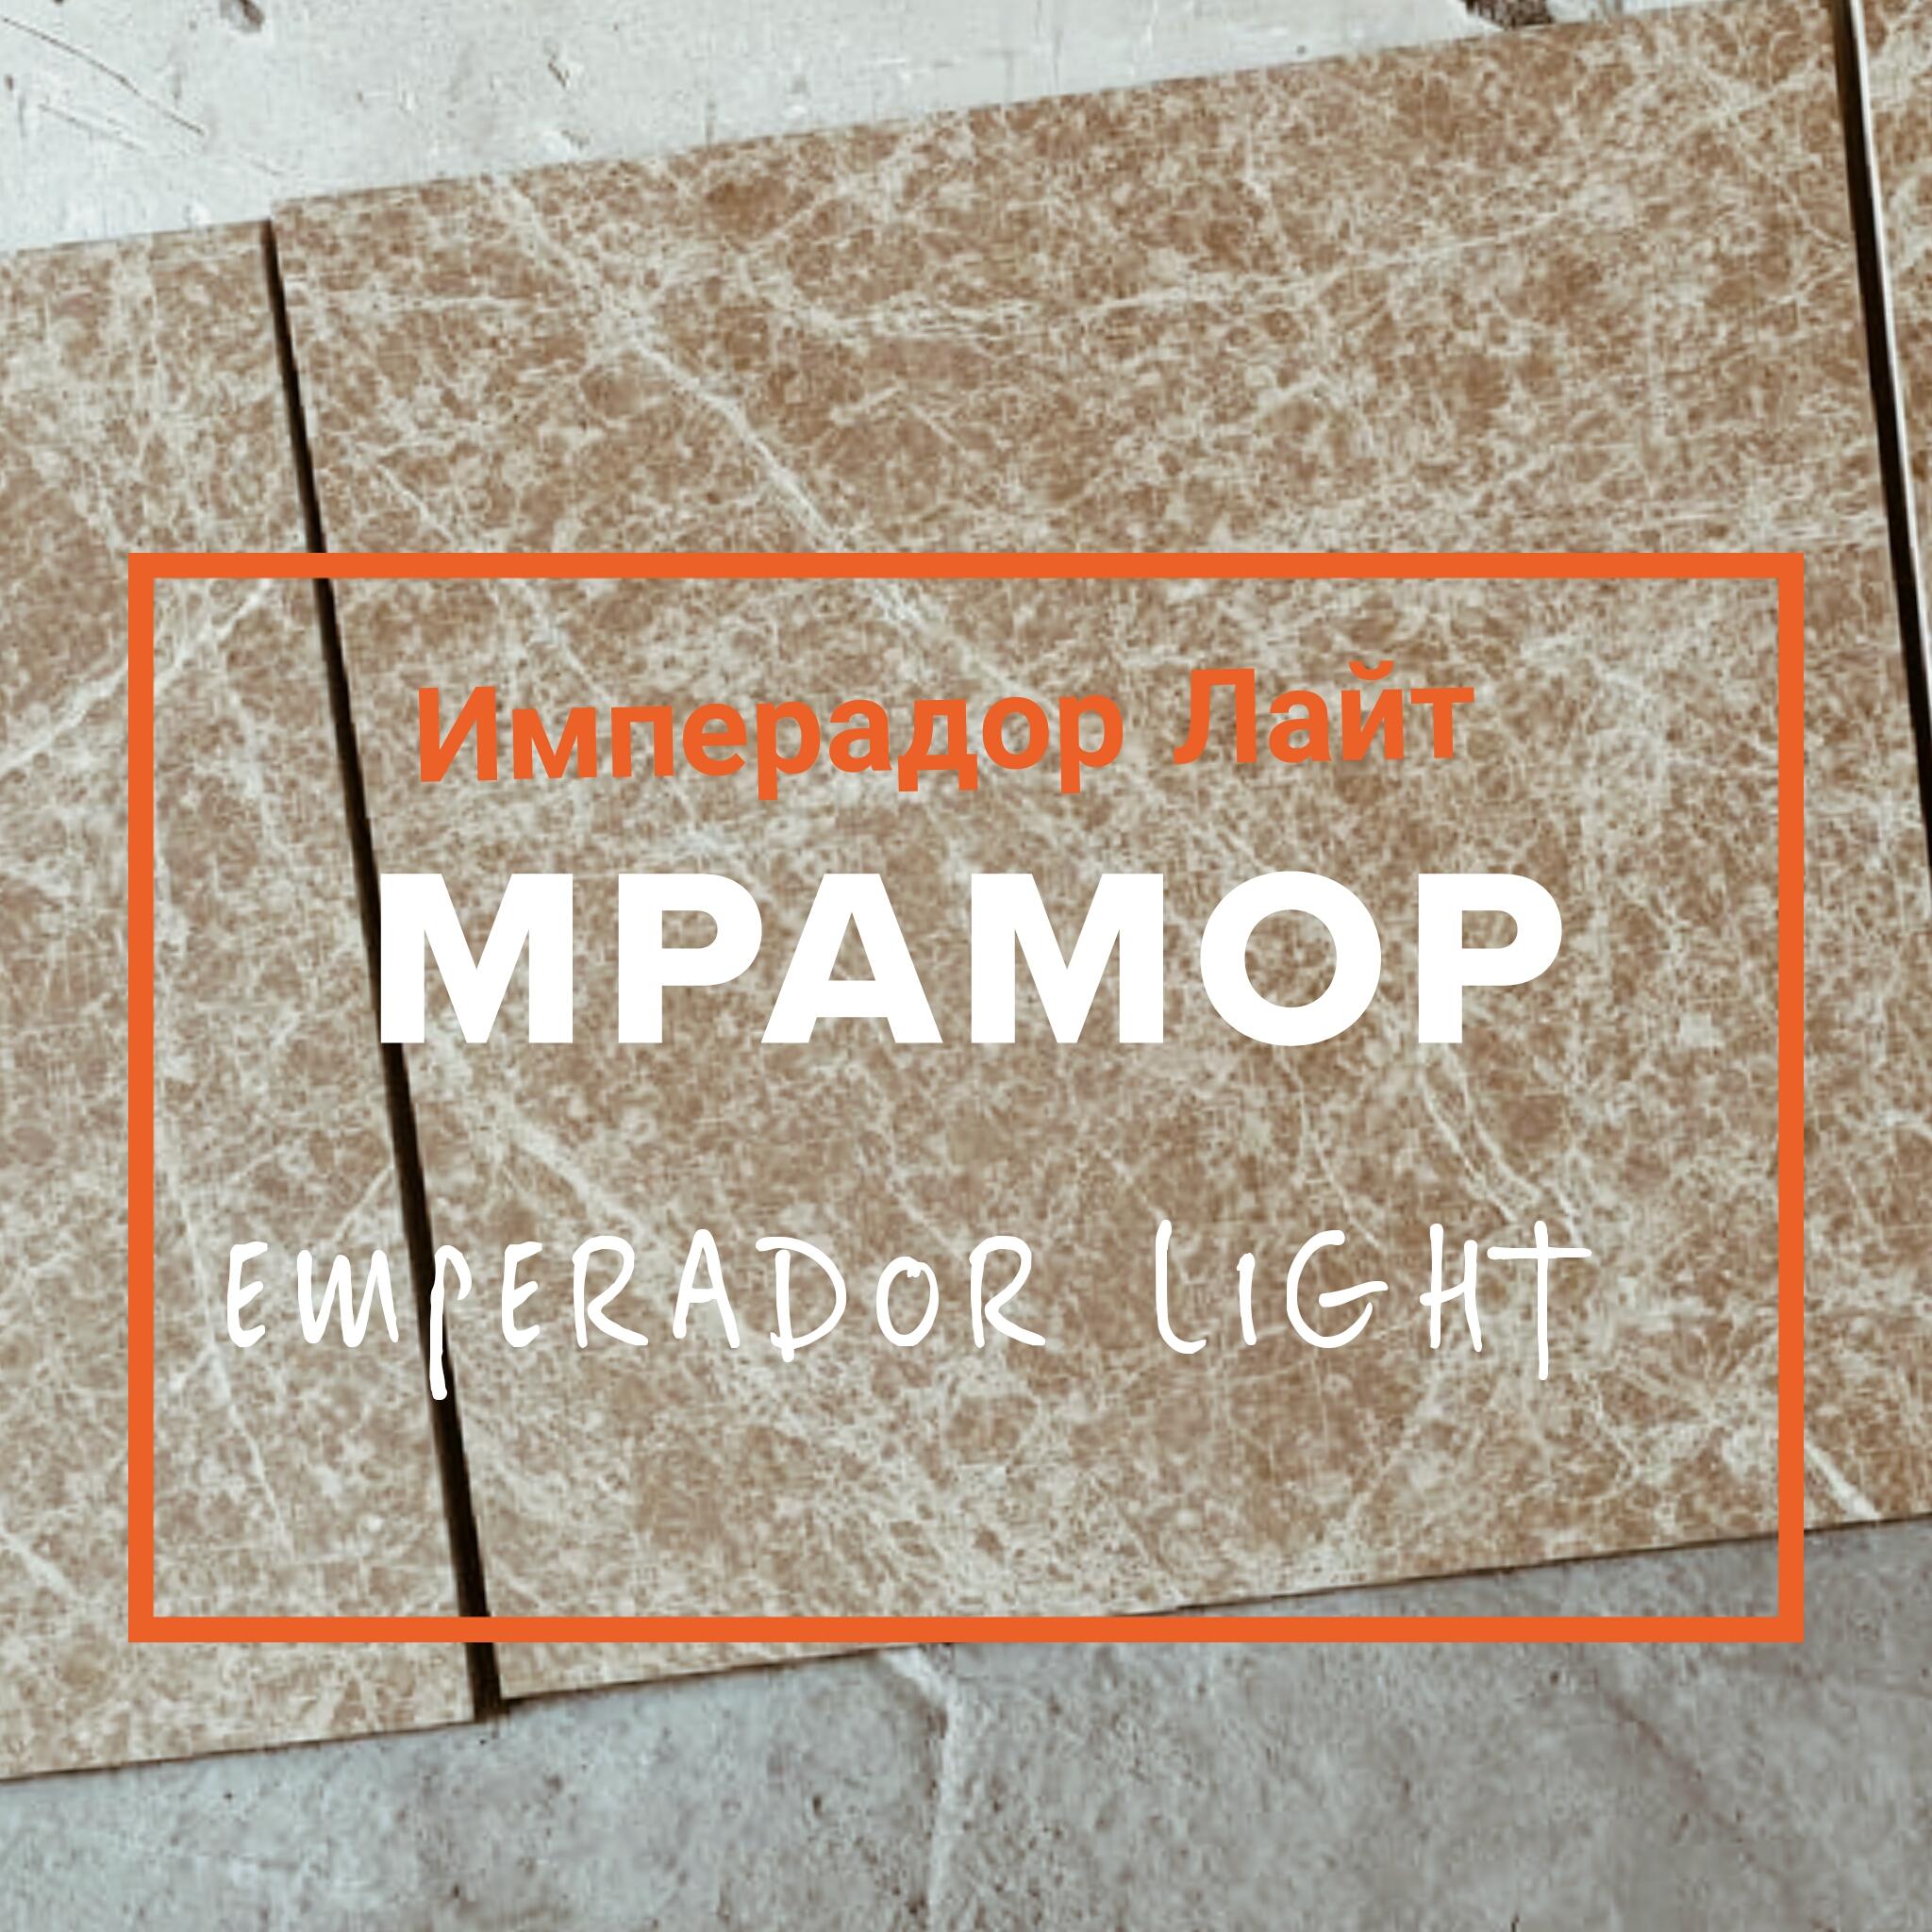 Emperador Light / Имперадор Лайт